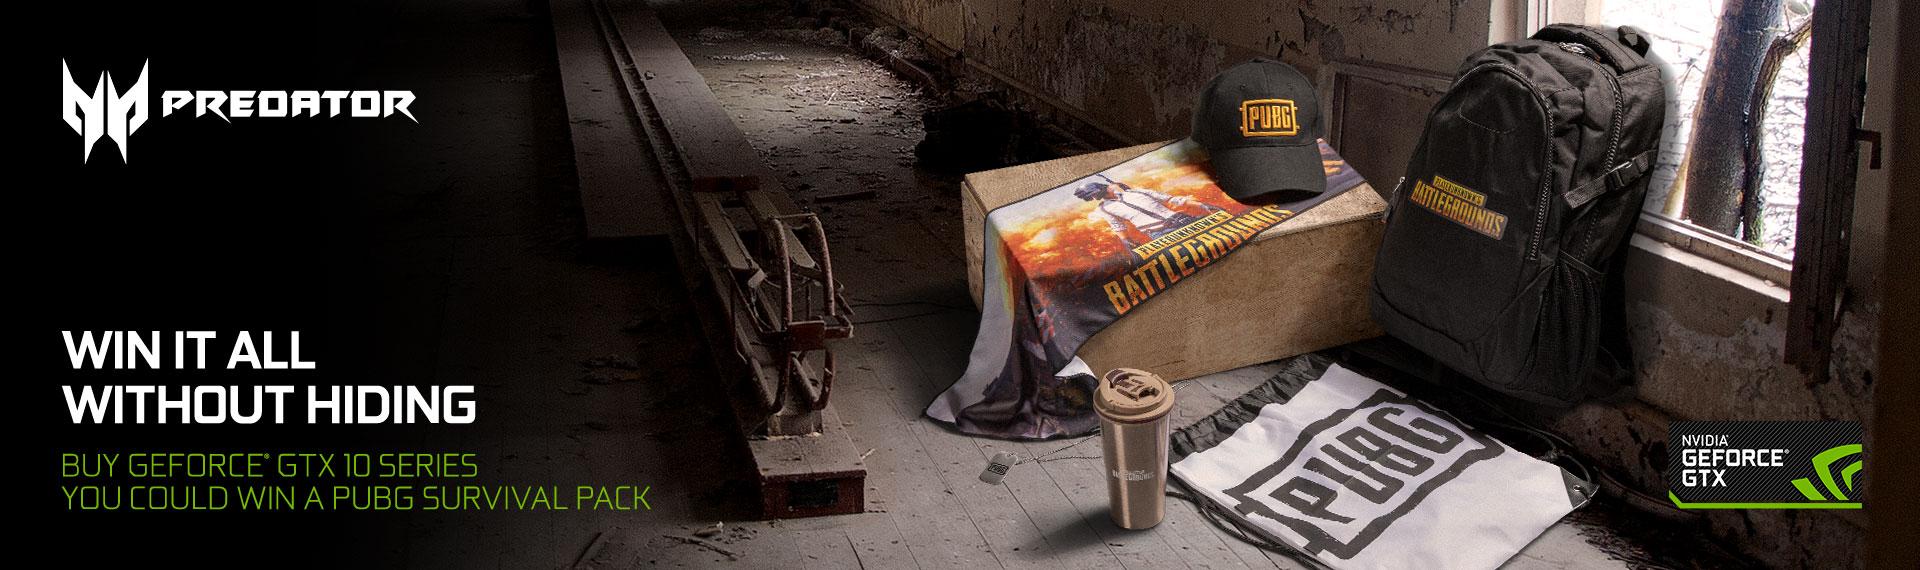 Dapatkan Limited Edition PUBG Survival Pack dalam Promo NVIDIA® GeForce® Series!